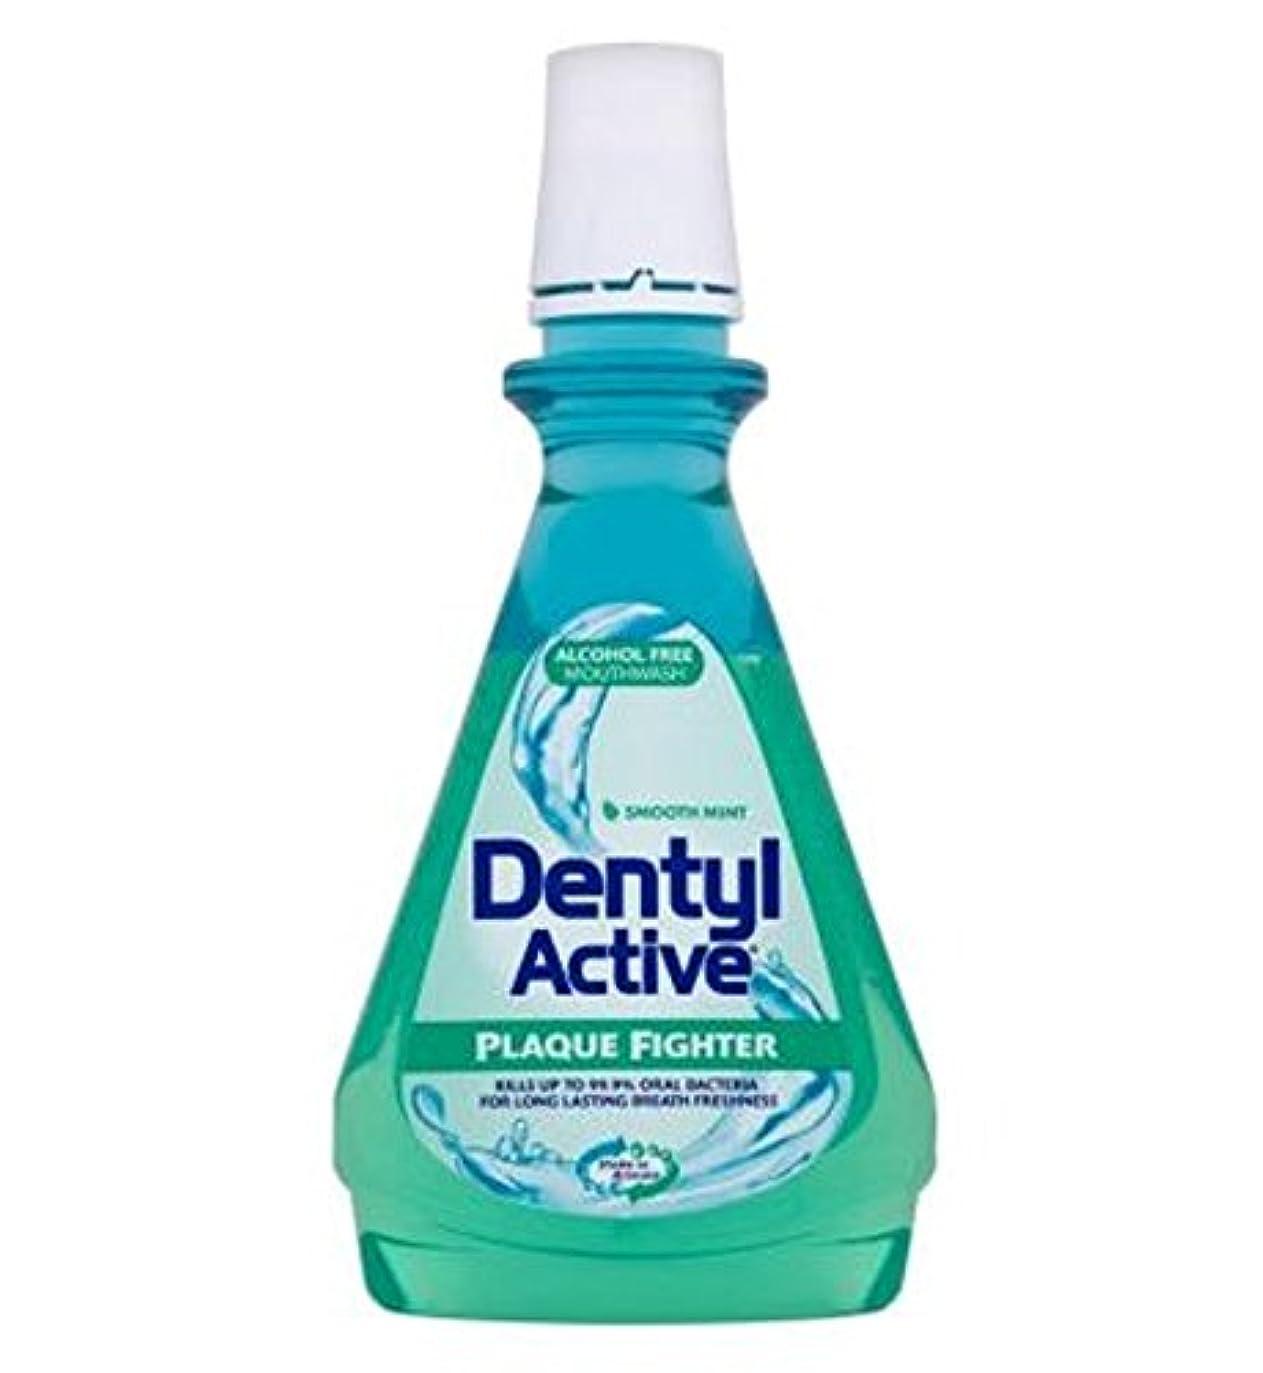 Dentylアクティブな滑らかなミントマウスウォッシュ500ミリリットル (Dentyl) (x2) - Dentyl Active Smooth Mint Mouthwash 500ml (Pack of 2) [並行輸入品]